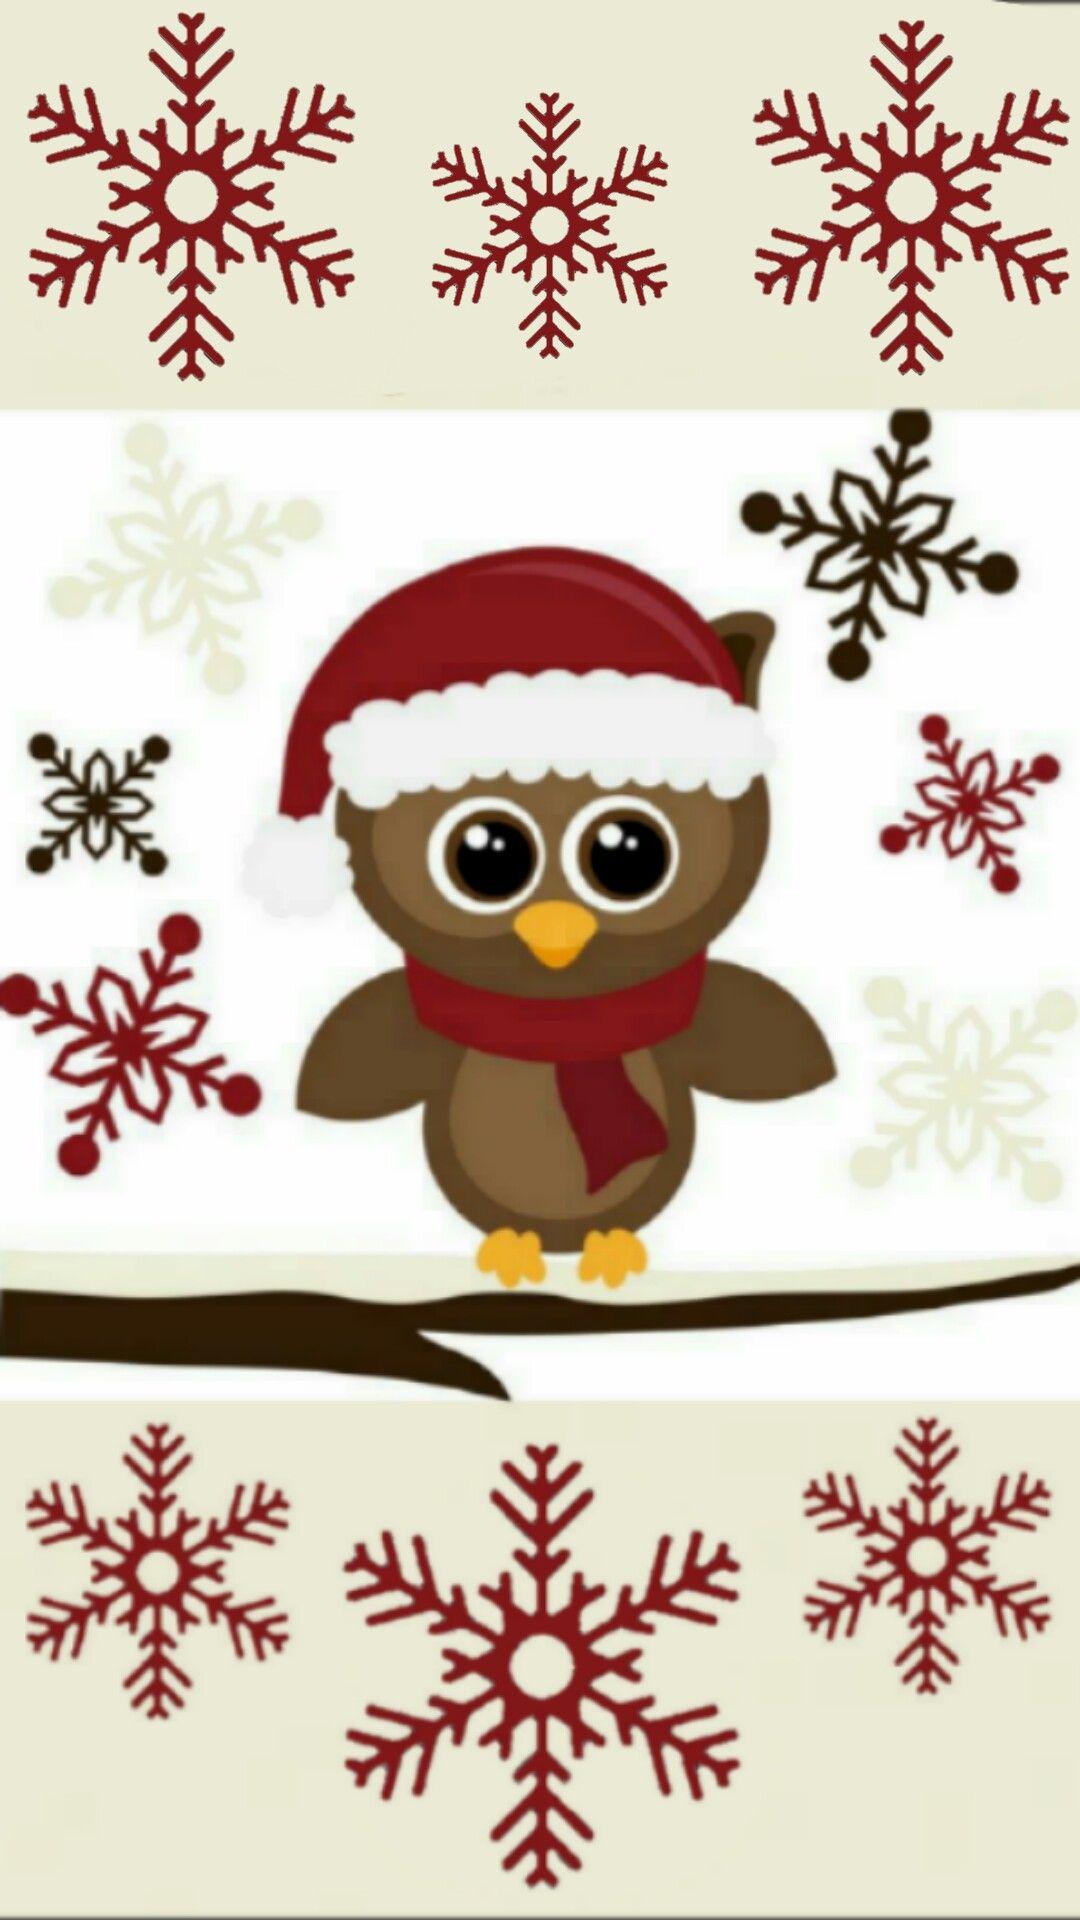 Pin By Rena Wright Nae On Cute Navidad Christmas Owls Owl Wallpaper Christmas Paintings